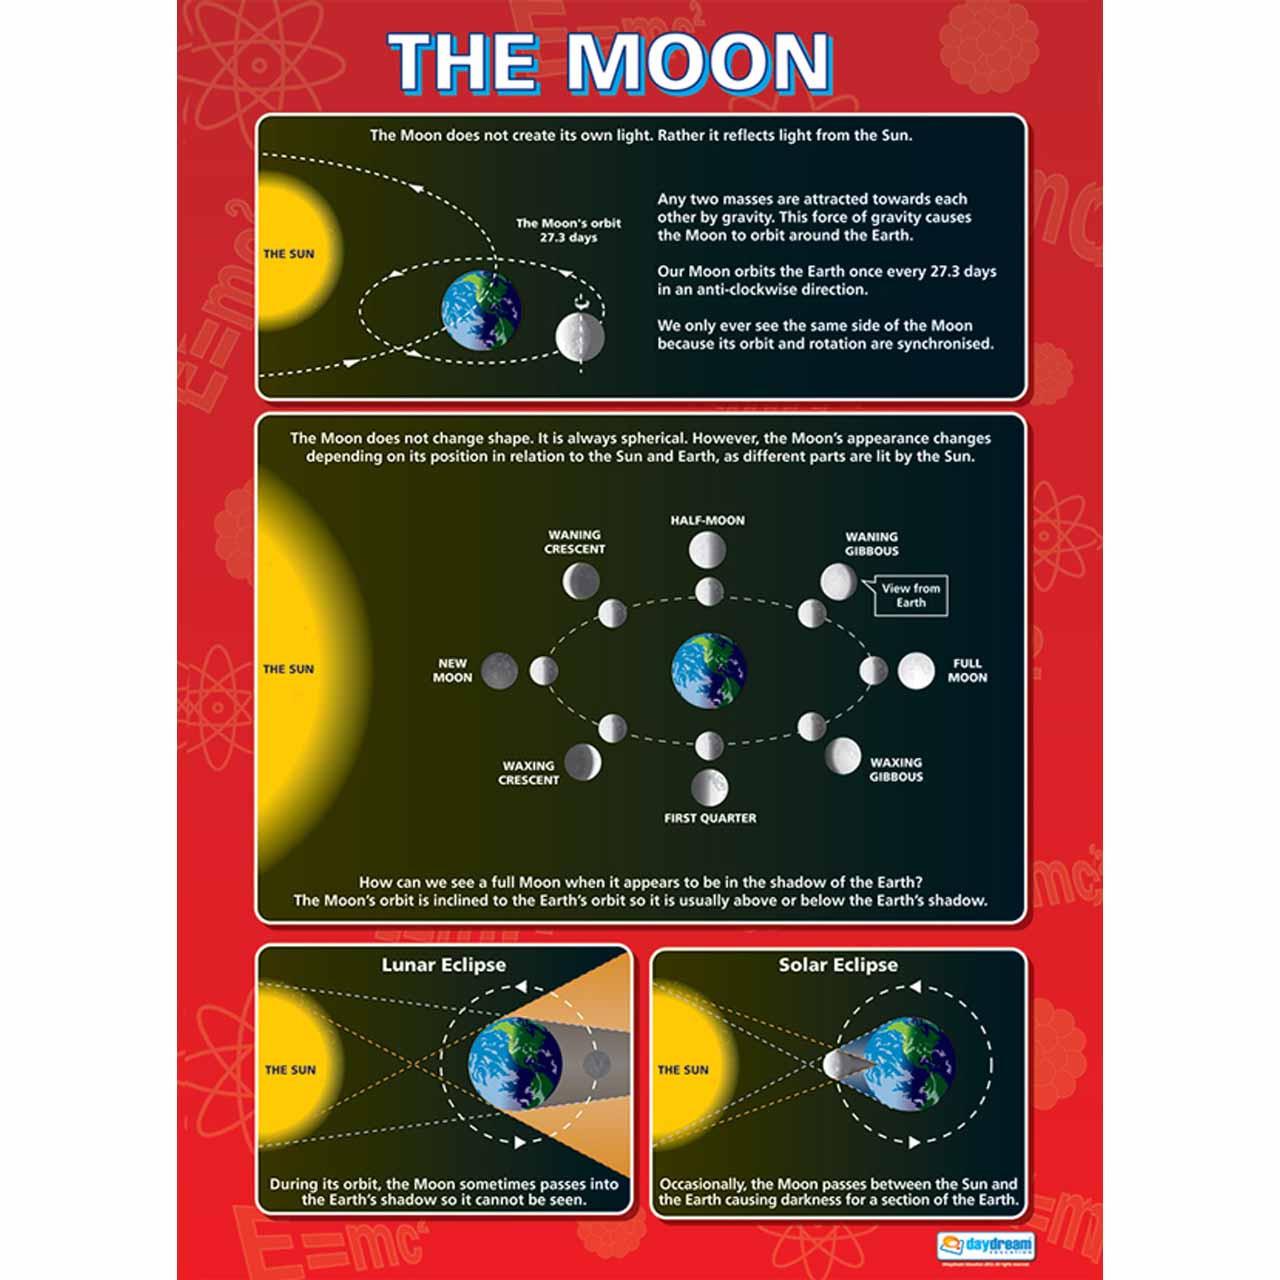 SC048L - The Moon Laminated